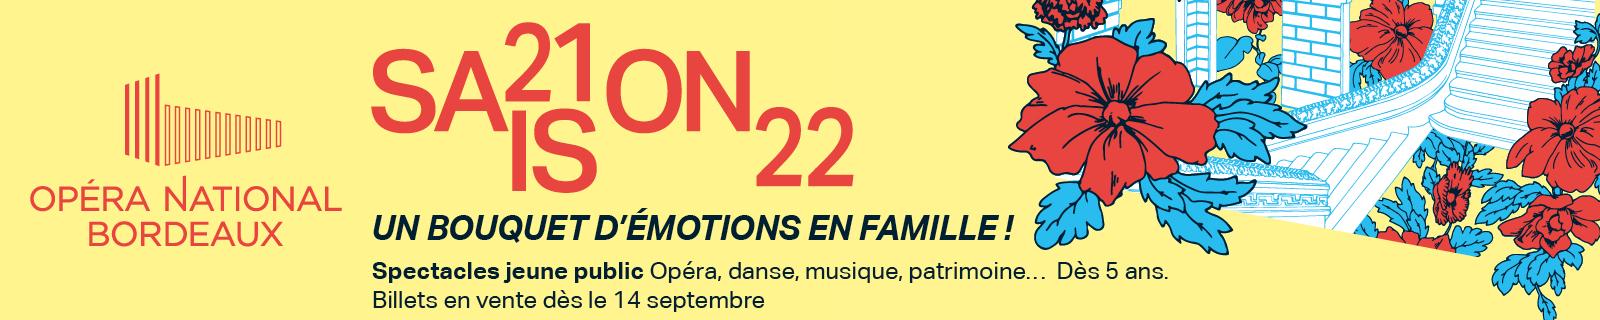 opera bordeaux saison 21-22